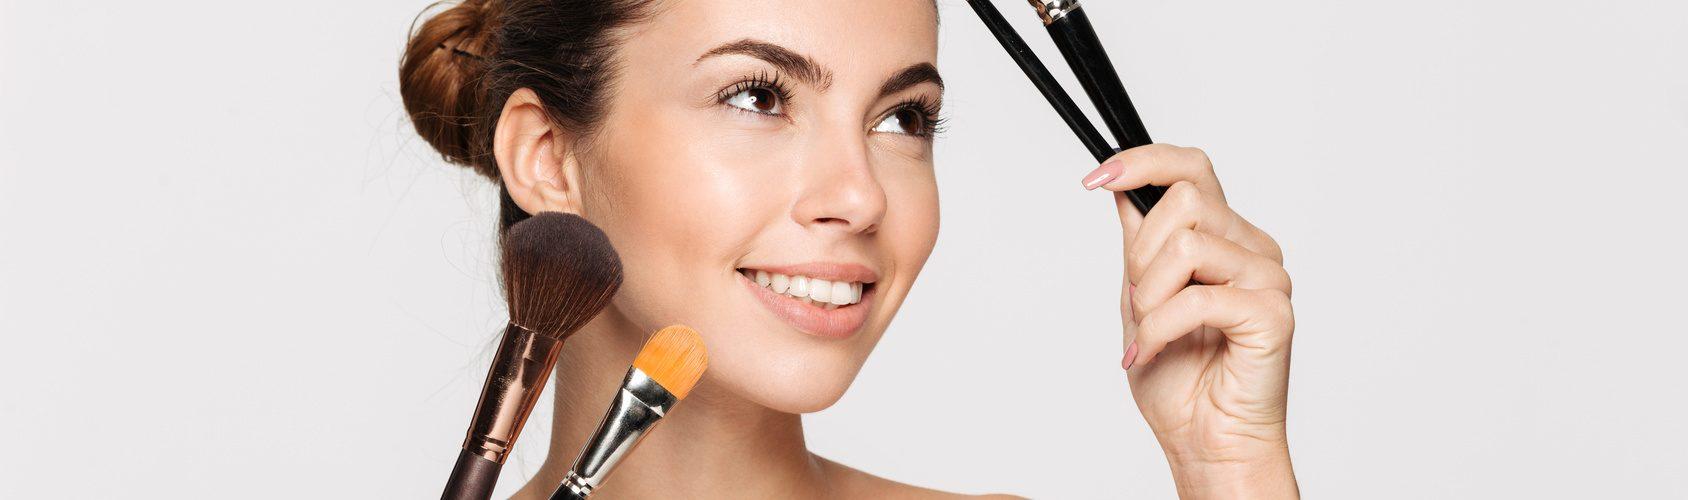 Make-up Profi, Visagist